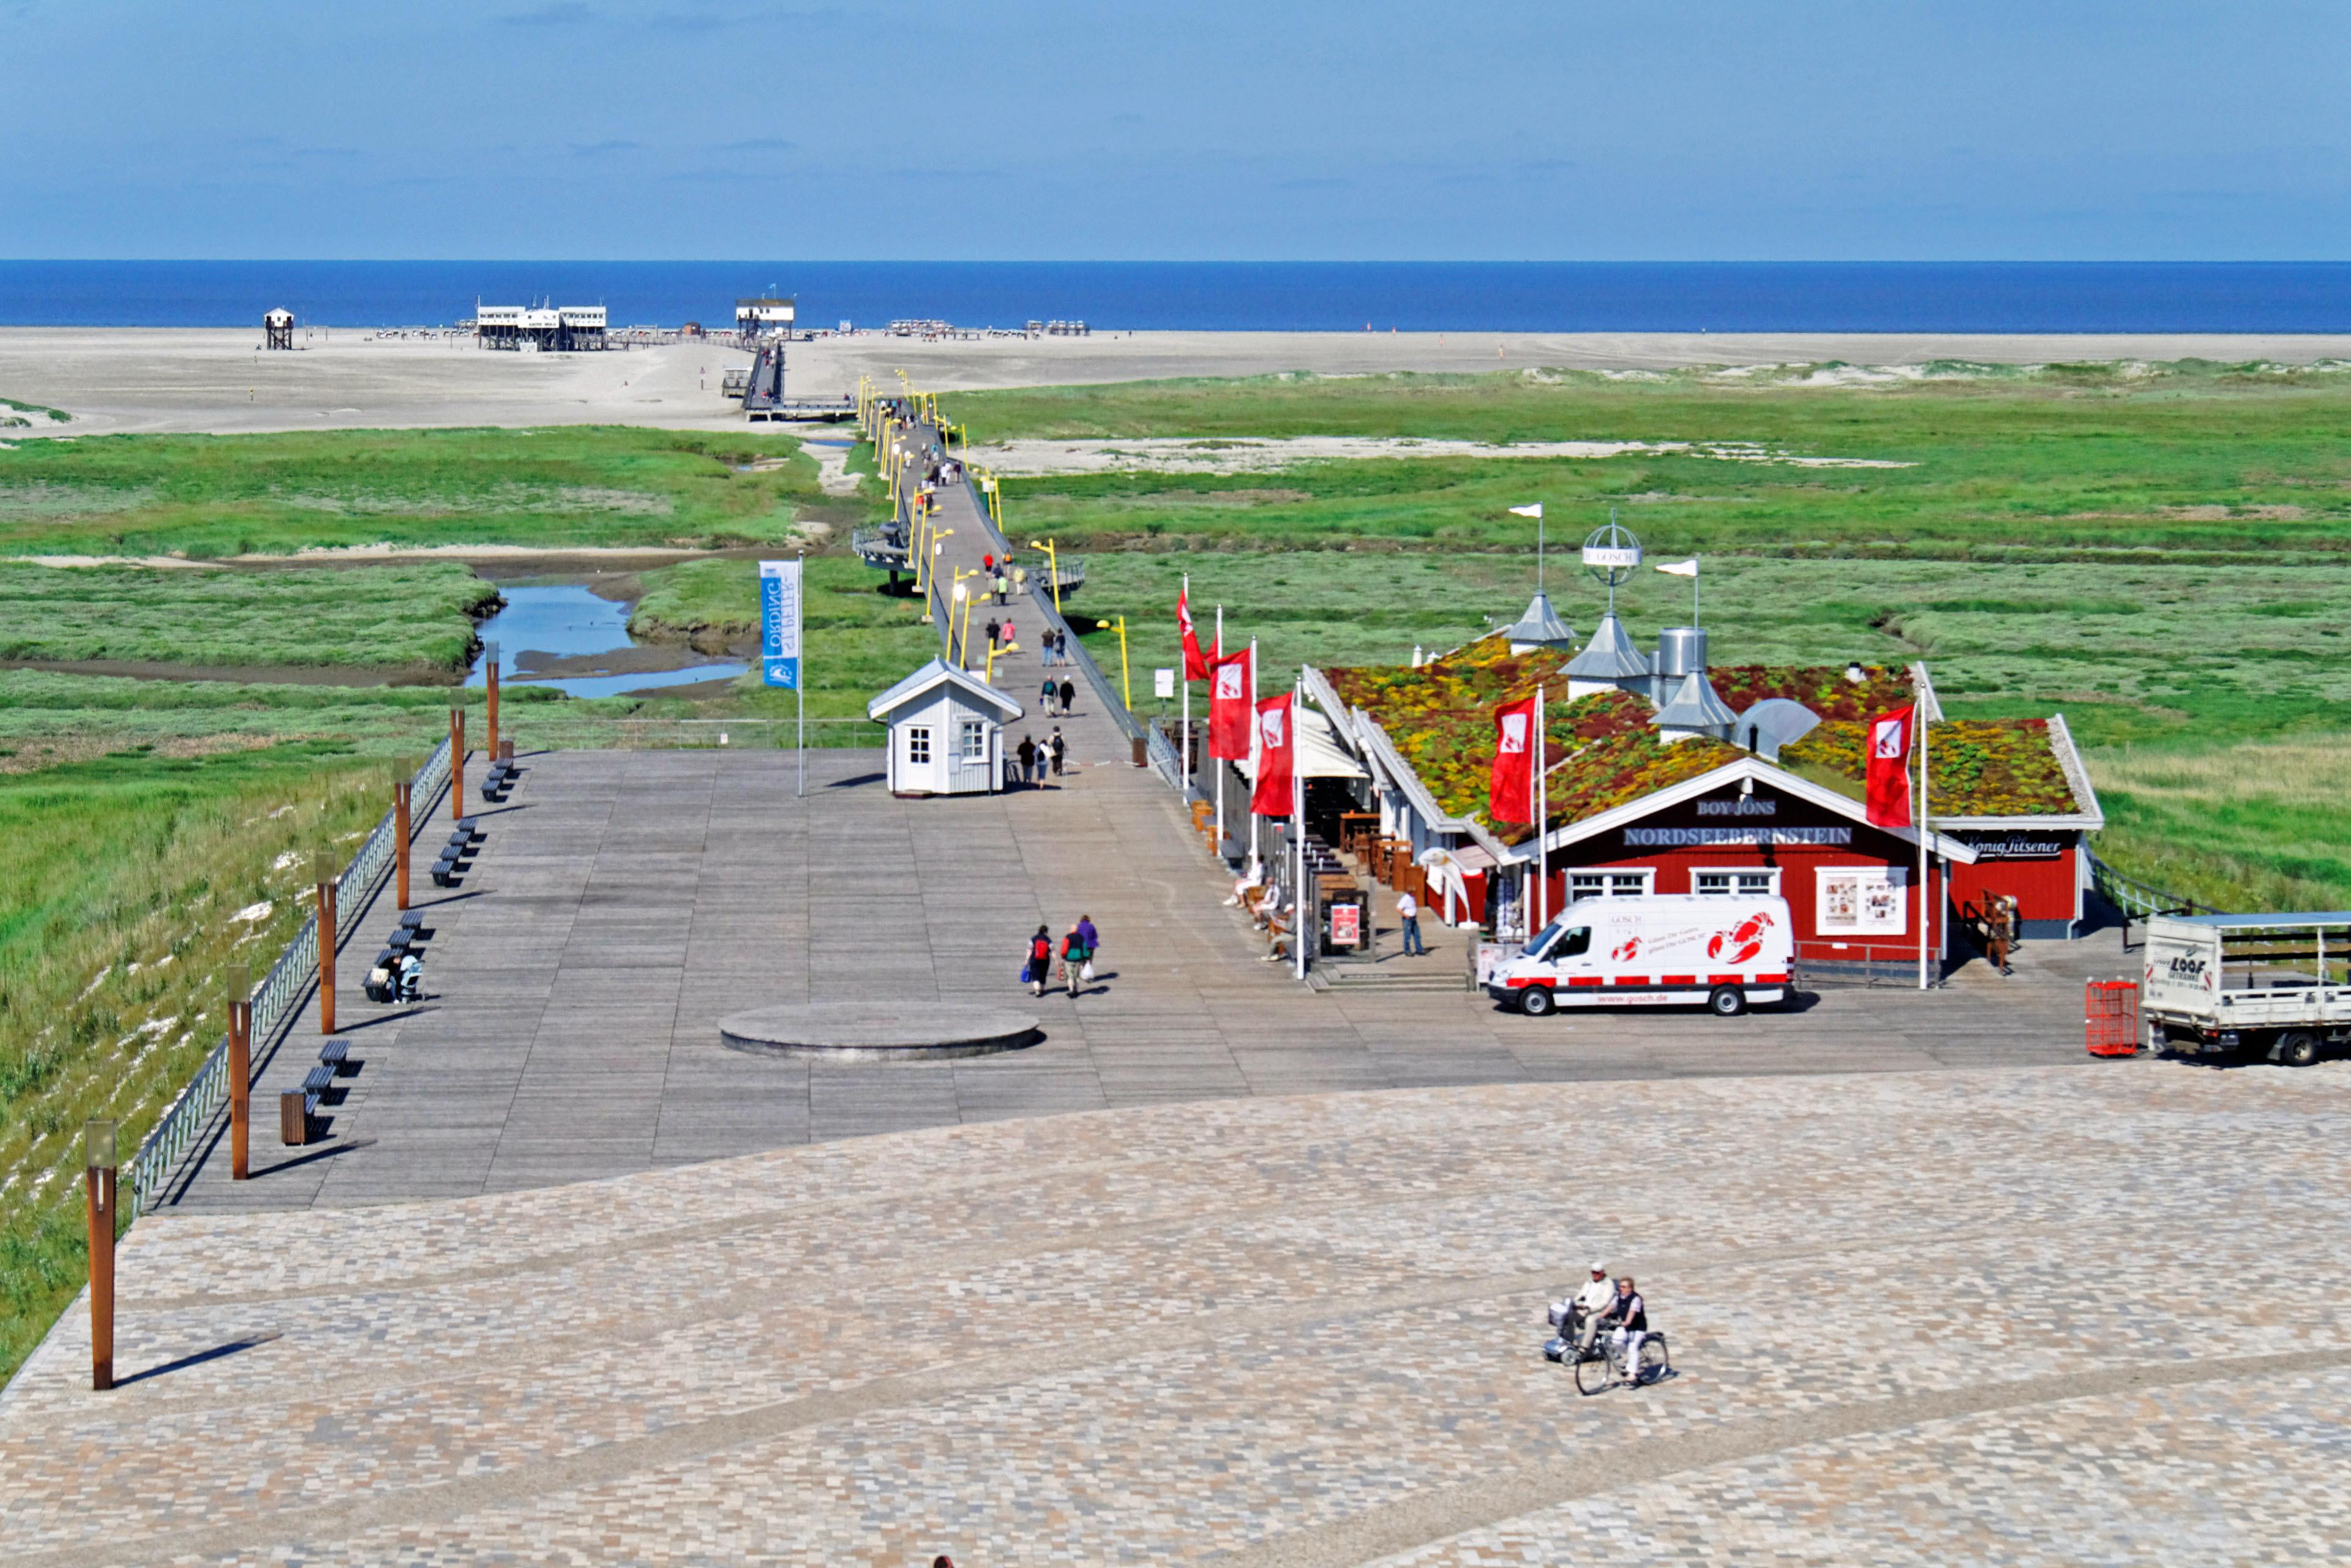 File:Erlebnispromenade SPO 2010.jpg